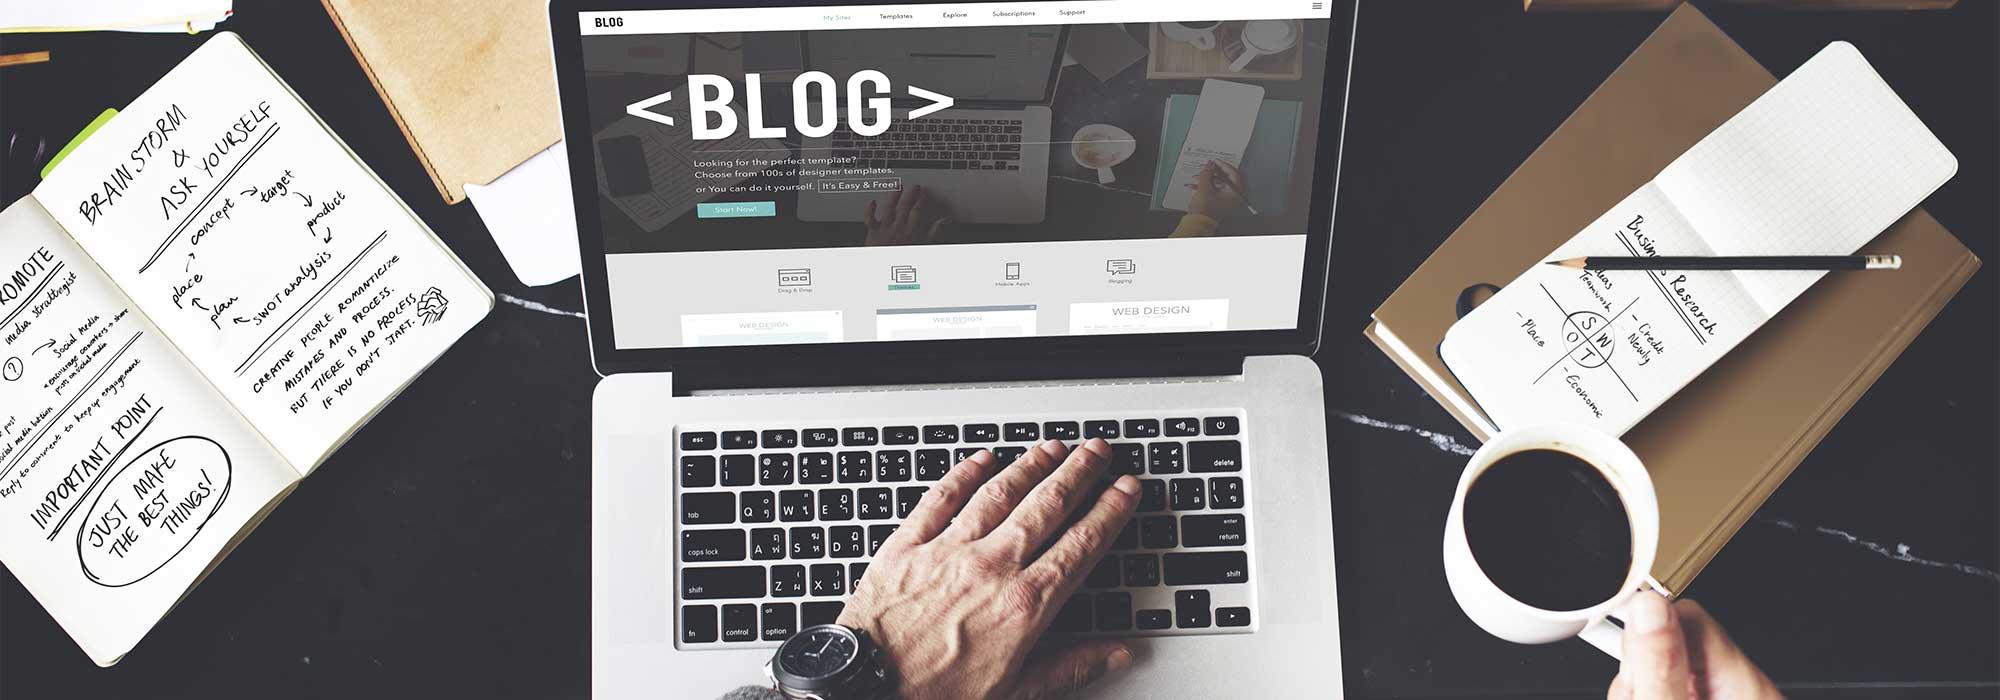 Perché è importante avere un blog aziendale?